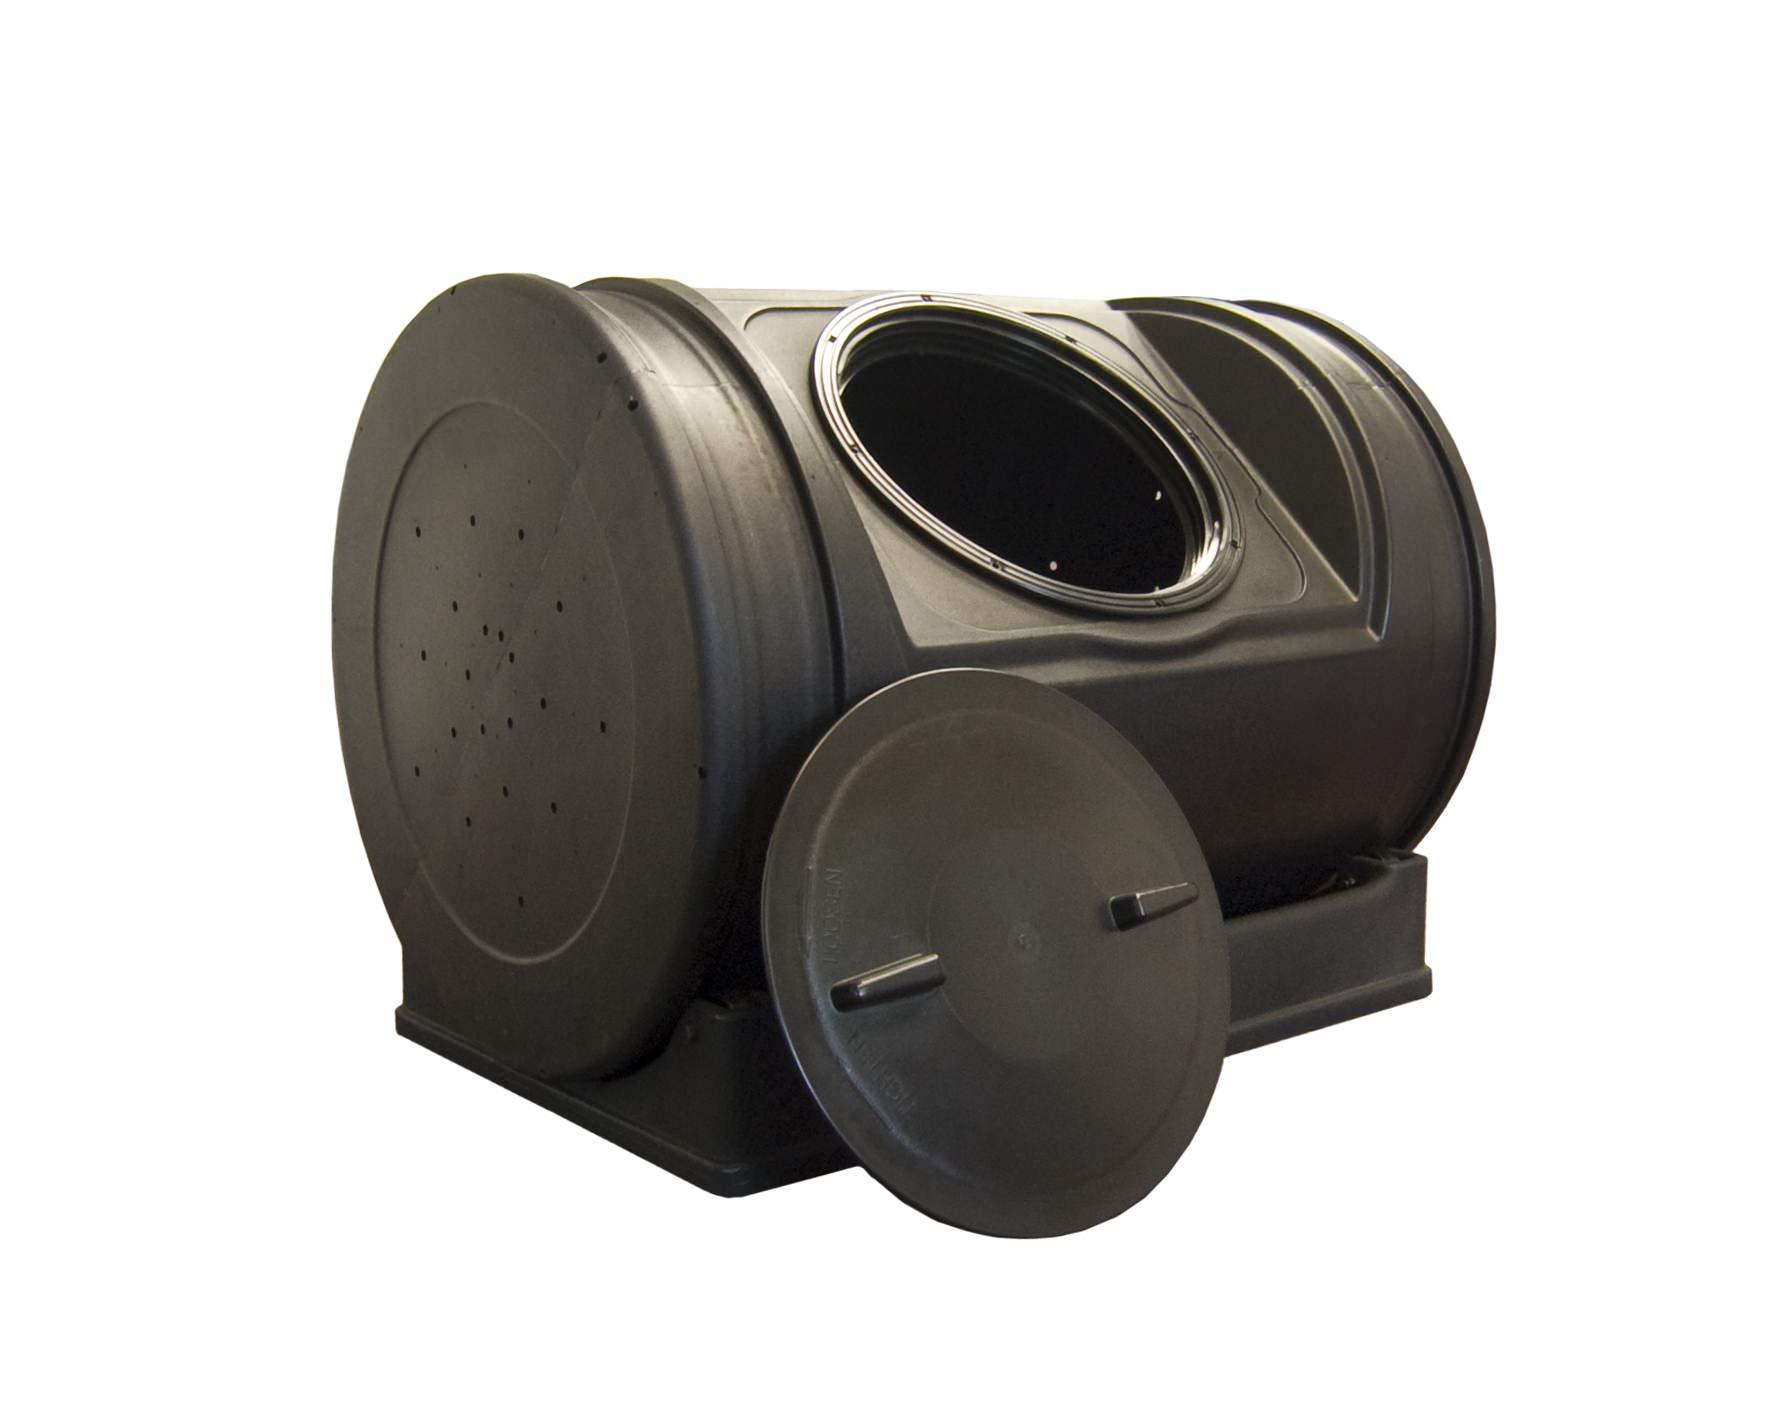 Good Ideas EZCJR-BLK 7-Cubic-Foot Compost Wizard Jr. product image